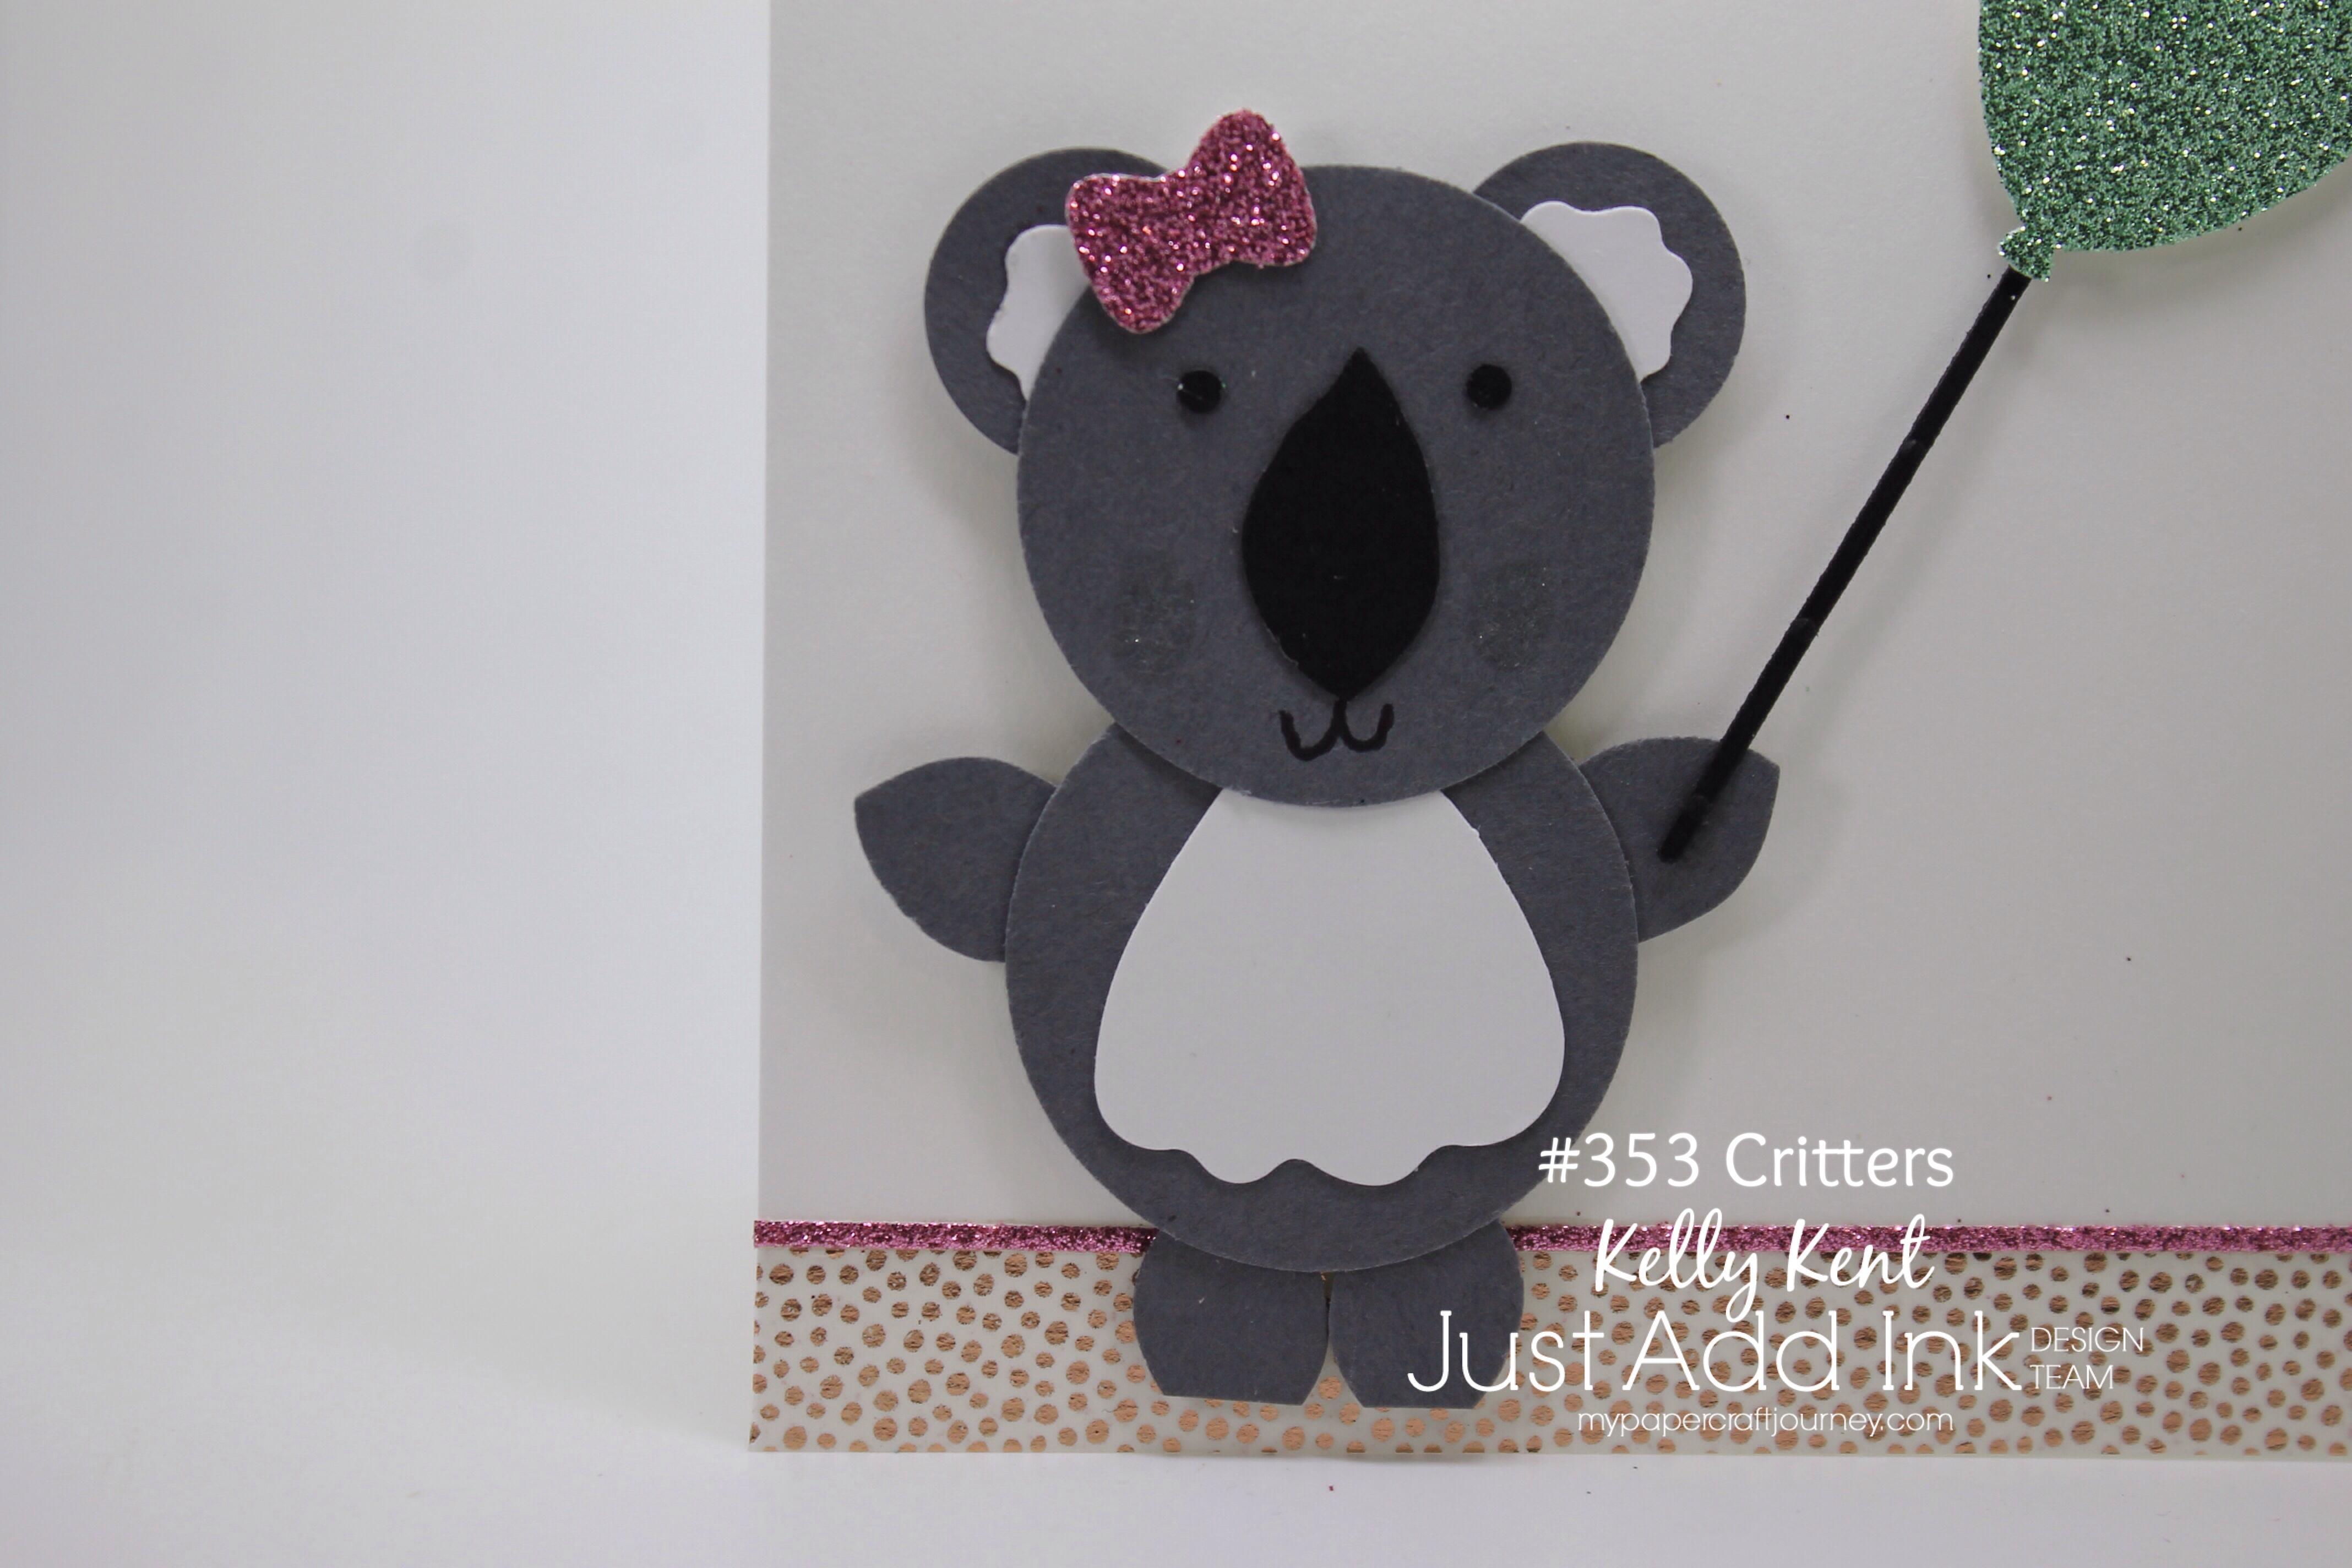 Just Add Ink #353 - Critters: Koala punch art. Kelly Kent - mypapercraftjourney.com.